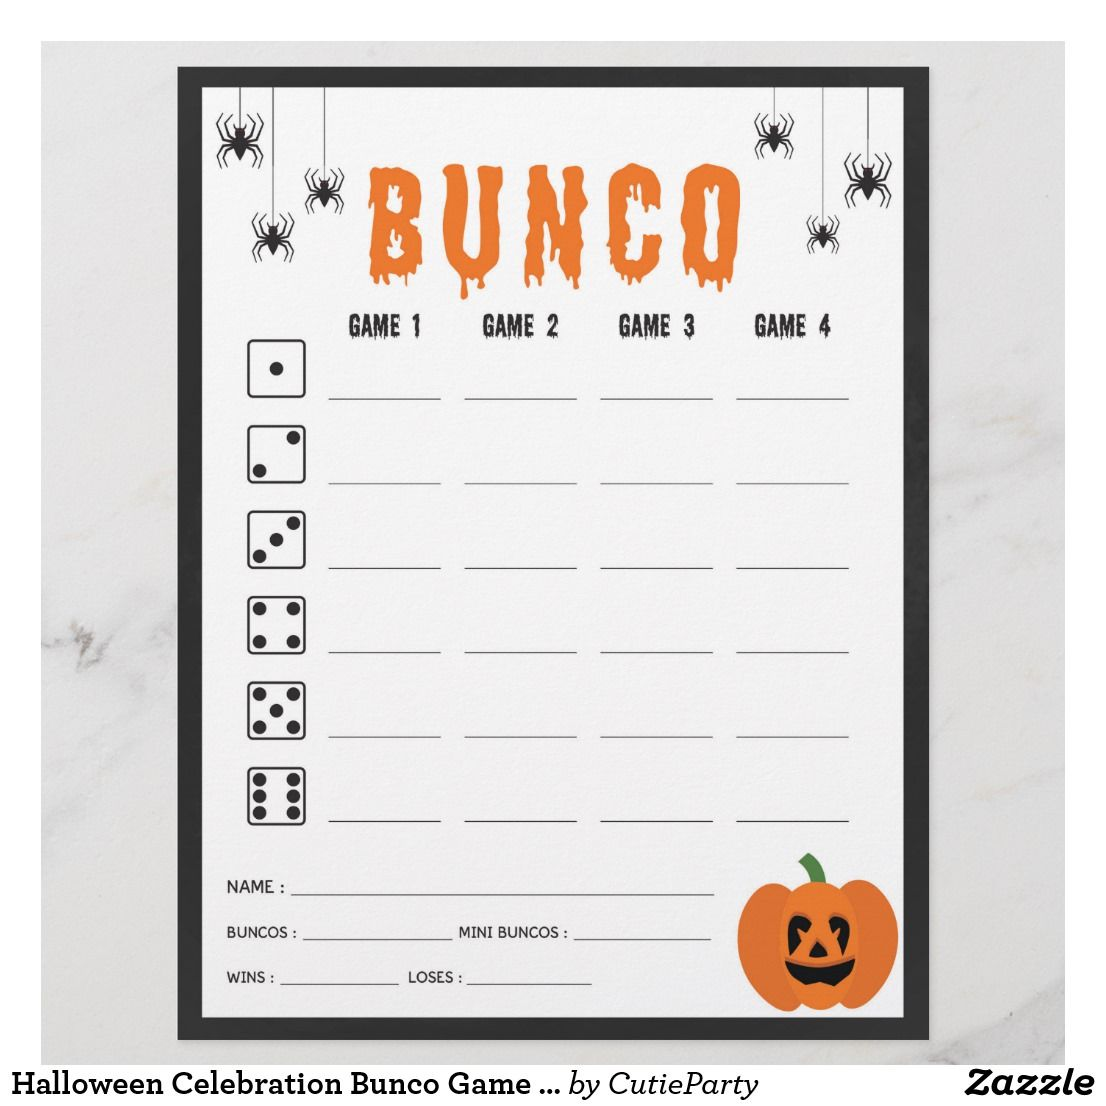 Halloween celebration bunco game score card